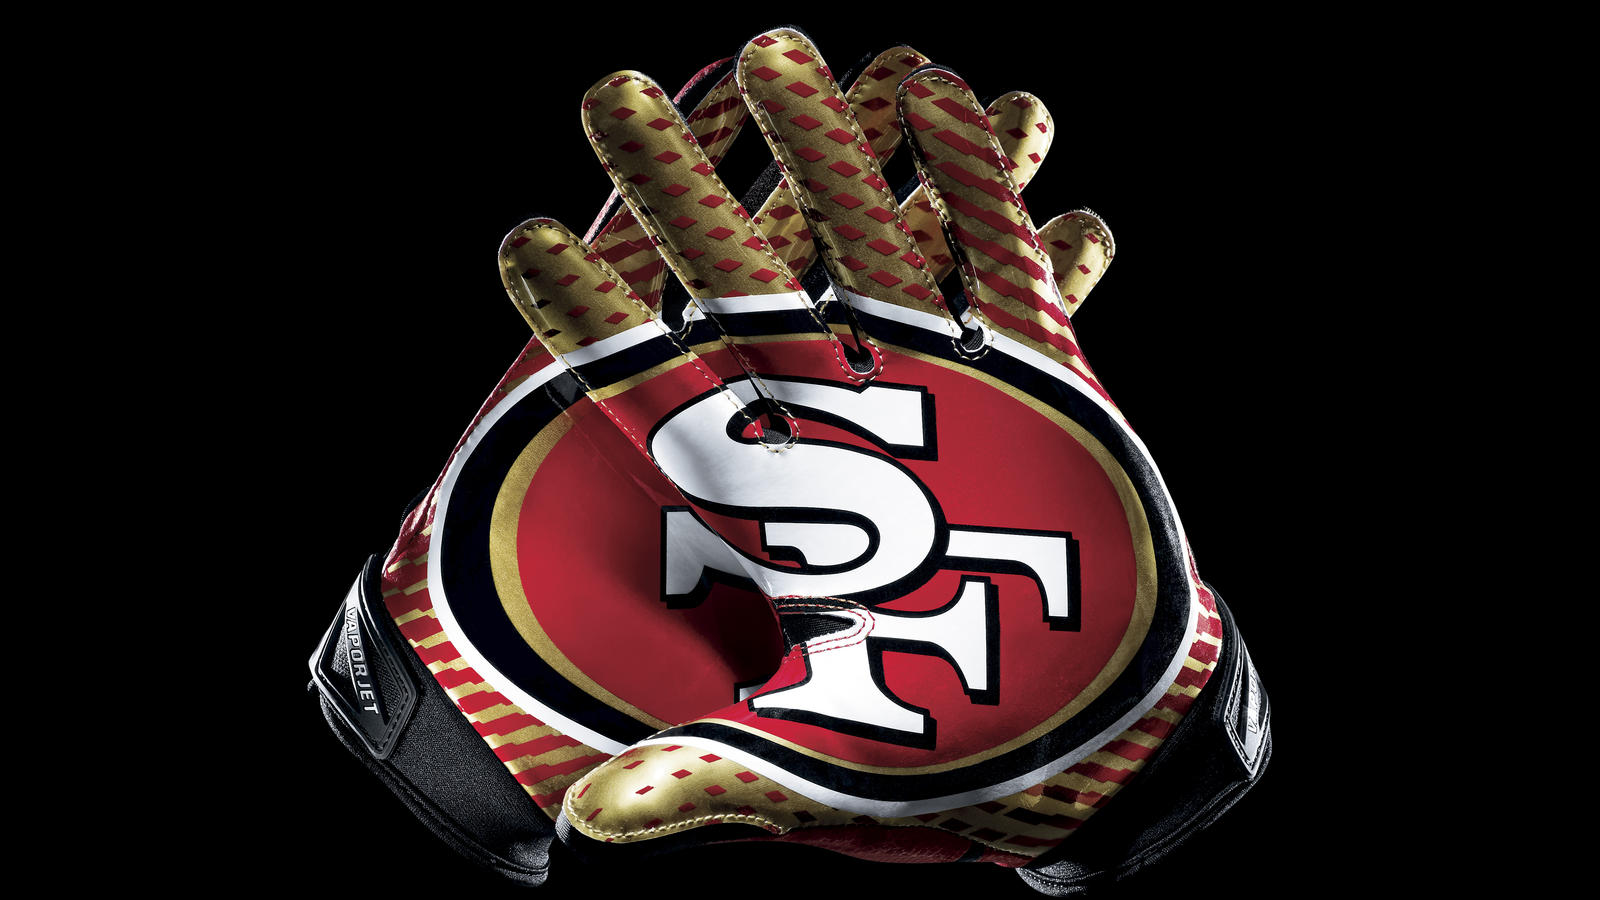 49ers Nike Wallpaper Hd